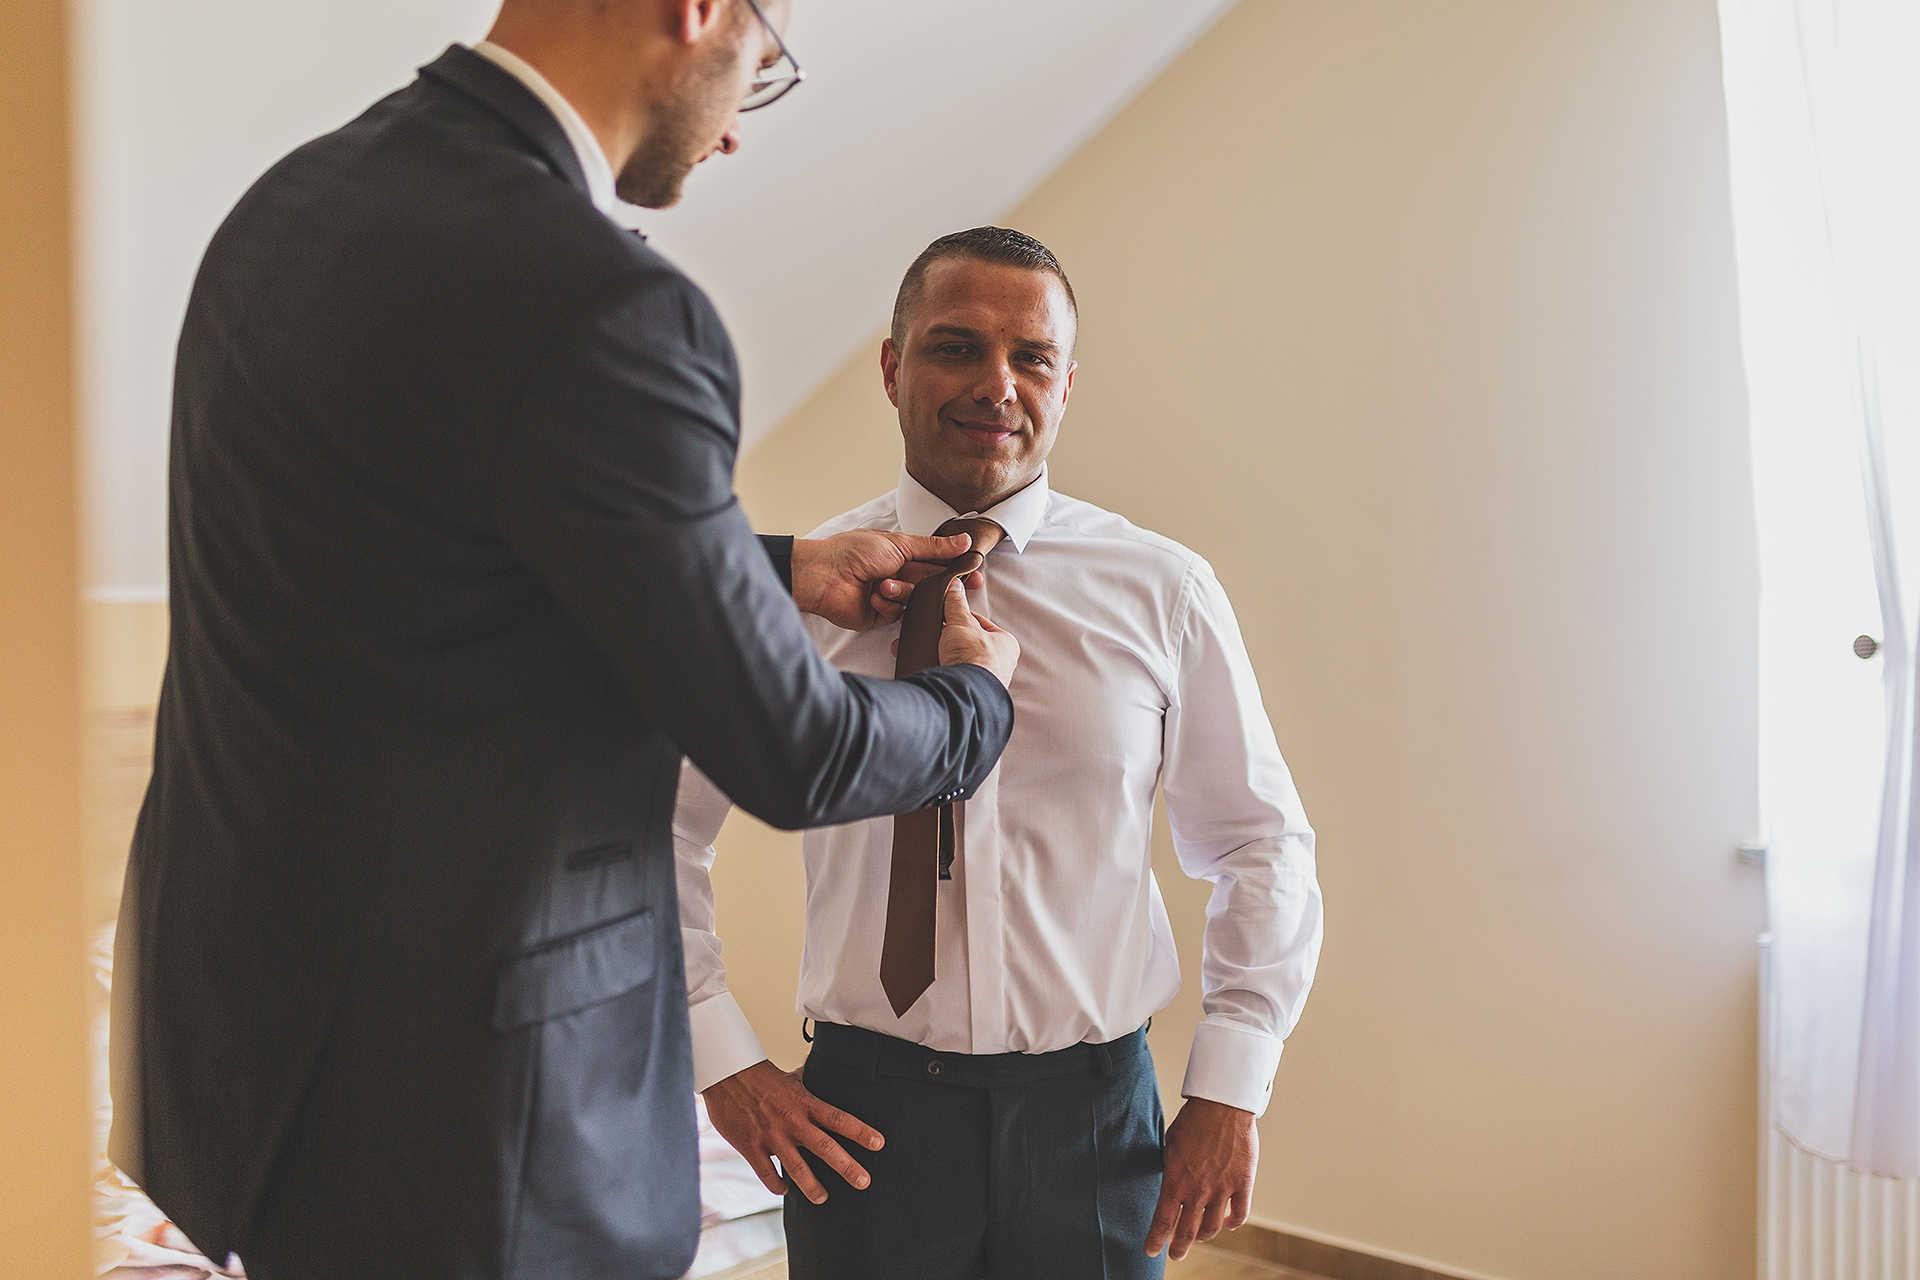 Reportaż - Krawat Pana Młodego